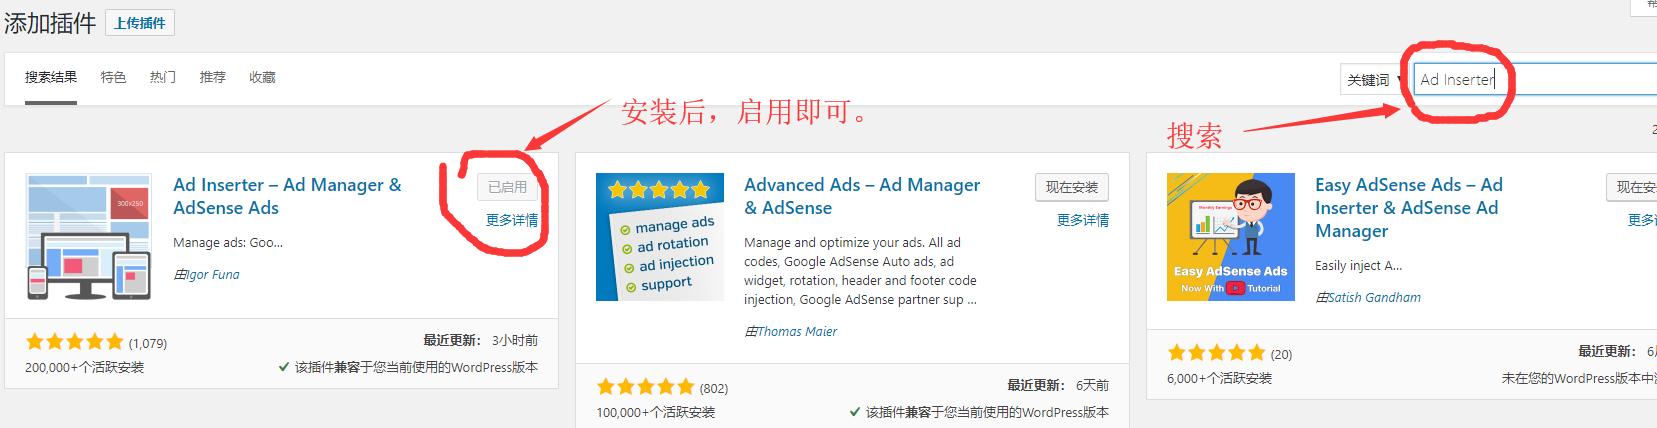 安装Ad Inserter插件